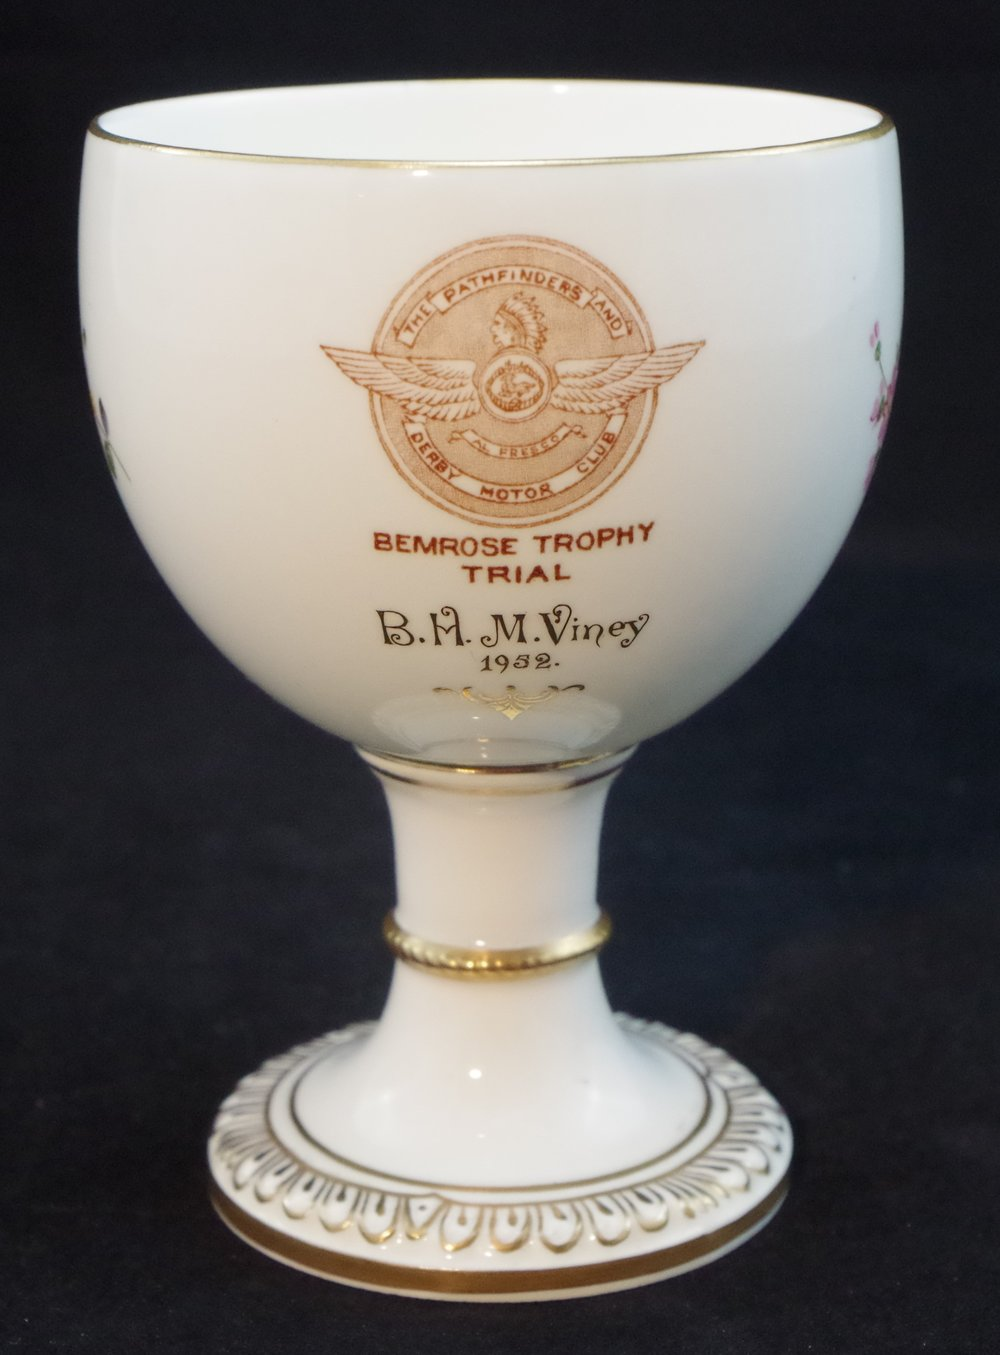 royal-crown-derby-goblet-1942-shape-derby-posie-the-pathfinders-and-derby-motor-club-bemrose-trophy-trial-1952-hugh-viney-A228-reverse